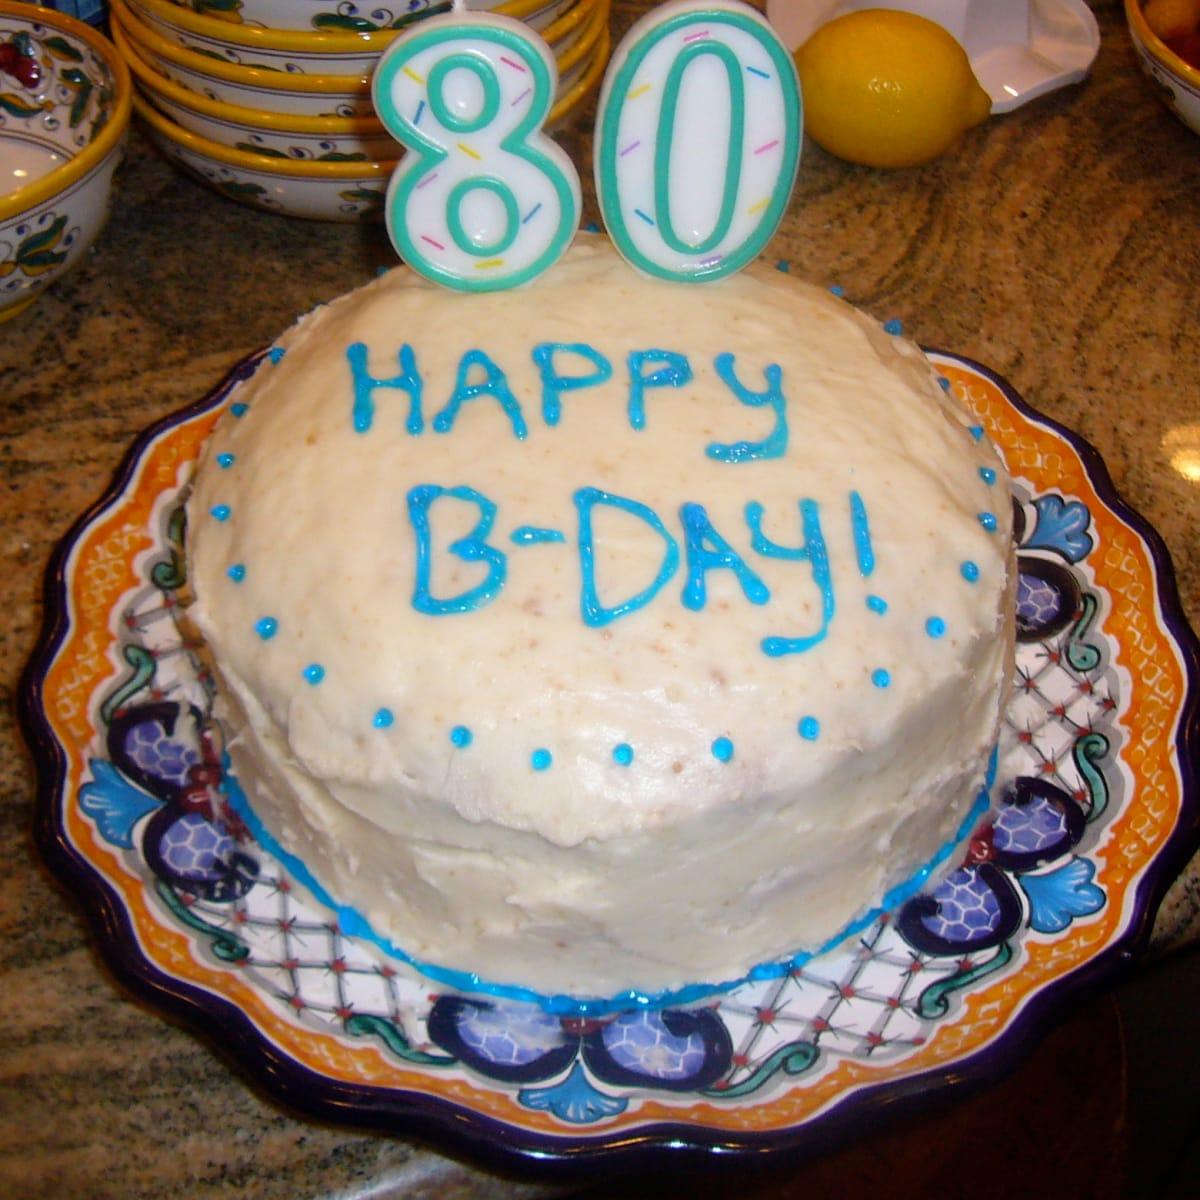 Incredible White Birthday Cake With Buttercream Frosting Jamie Geller Funny Birthday Cards Online Benoljebrpdamsfinfo